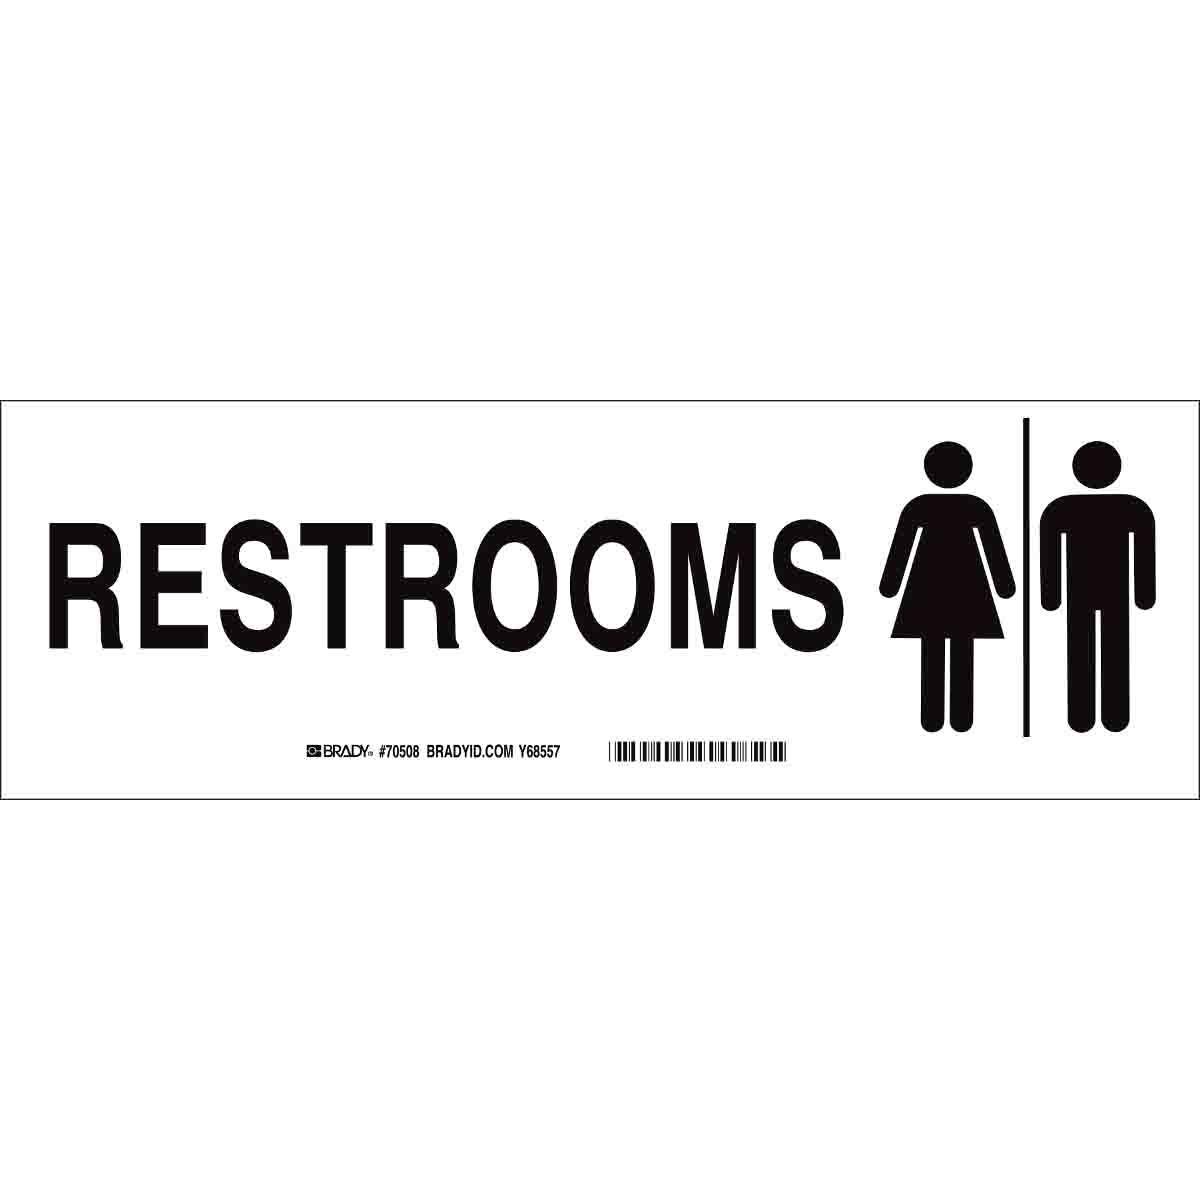 brady restroom sign